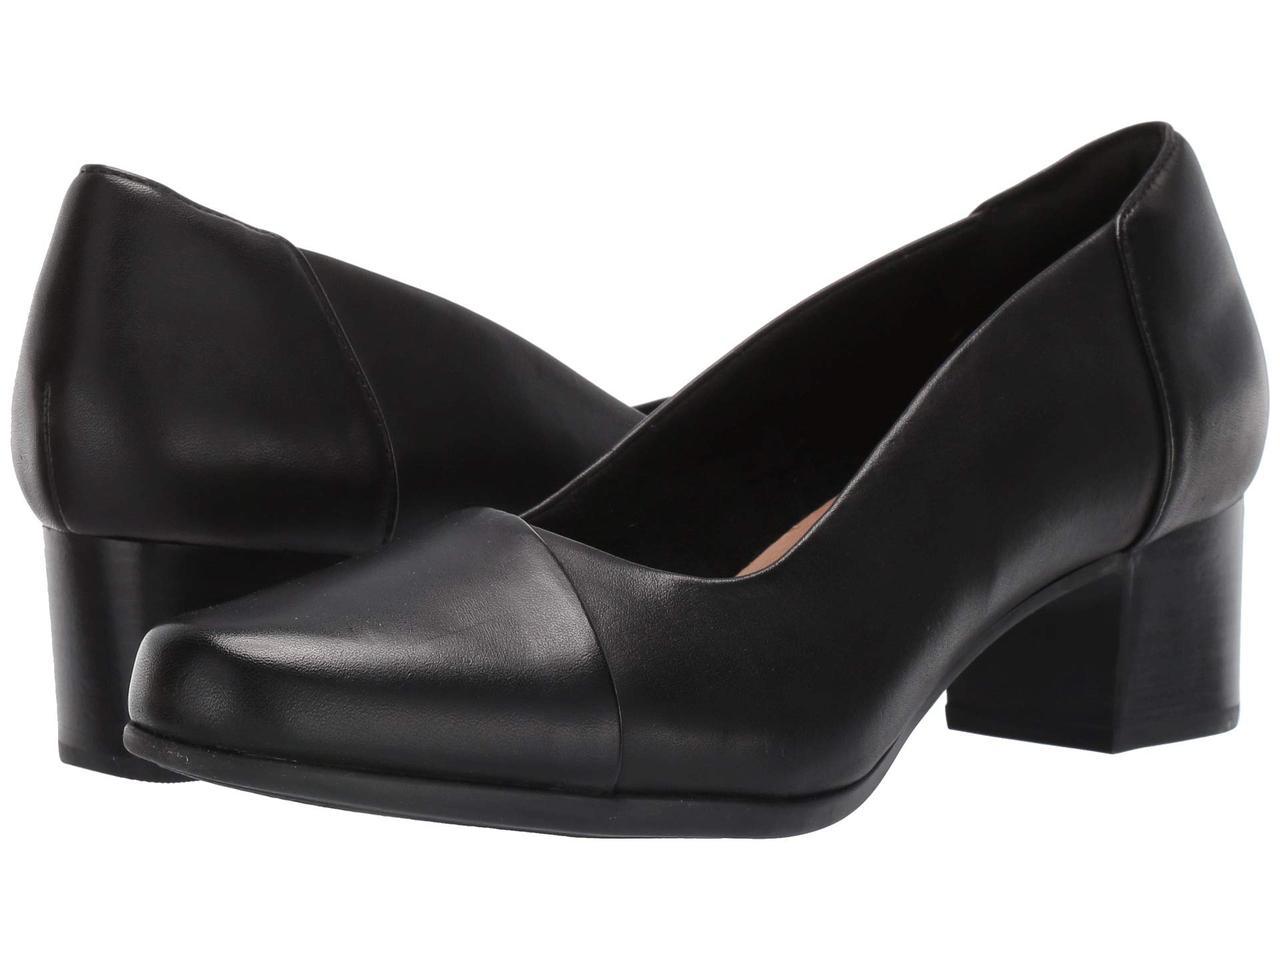 Туфли на каблуке (Оригинал) Clarks Un Damson Step Black Leather